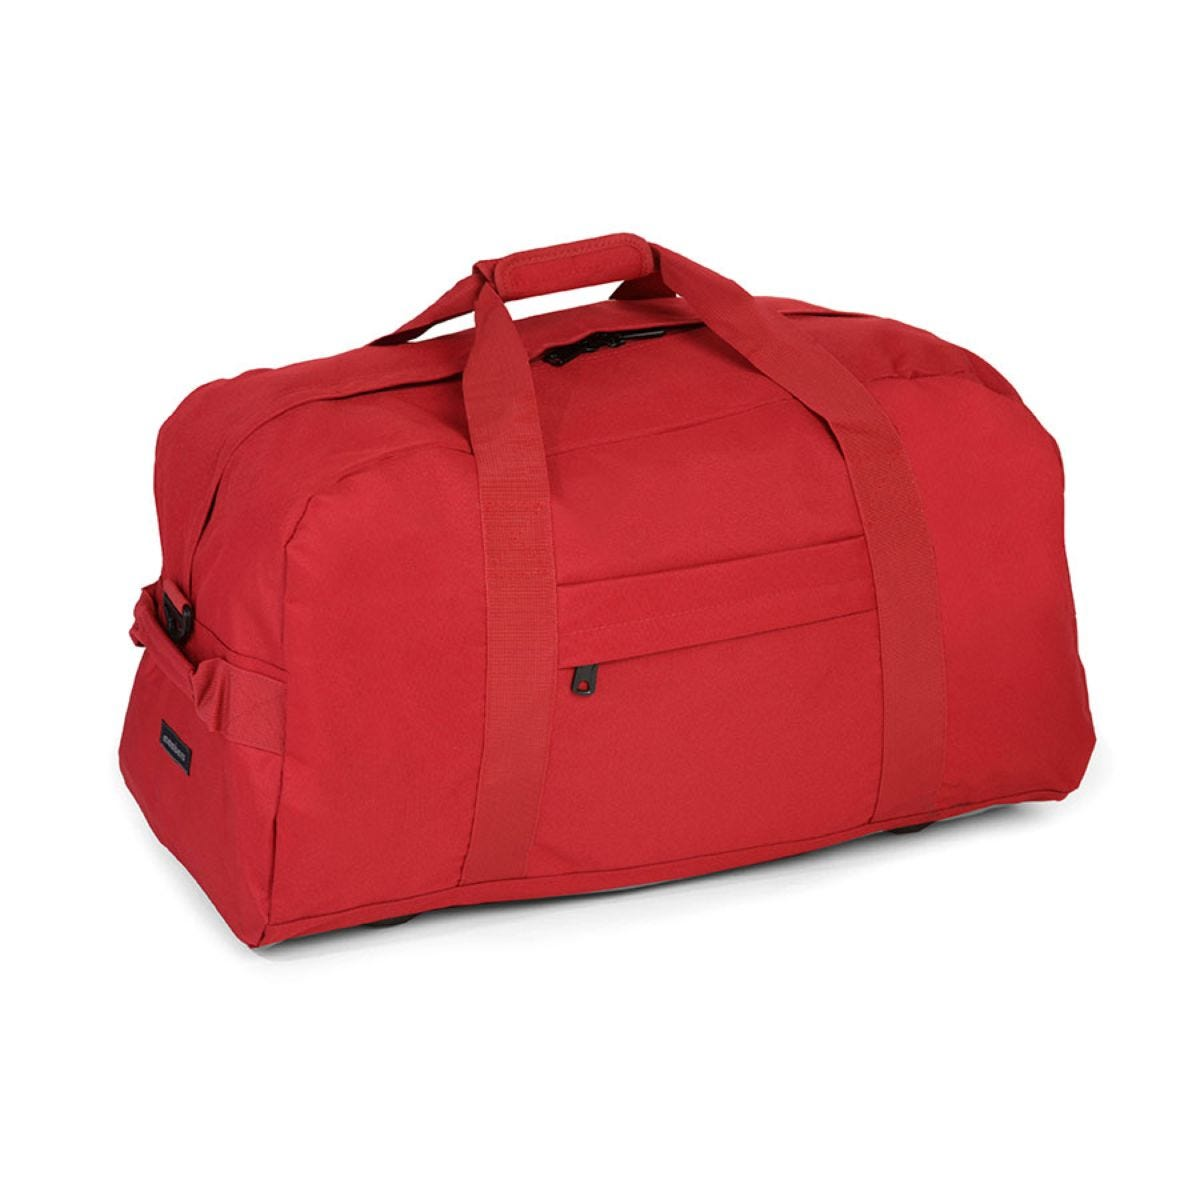 Members Medium 65cm Holdall / Duffle Bag - Red